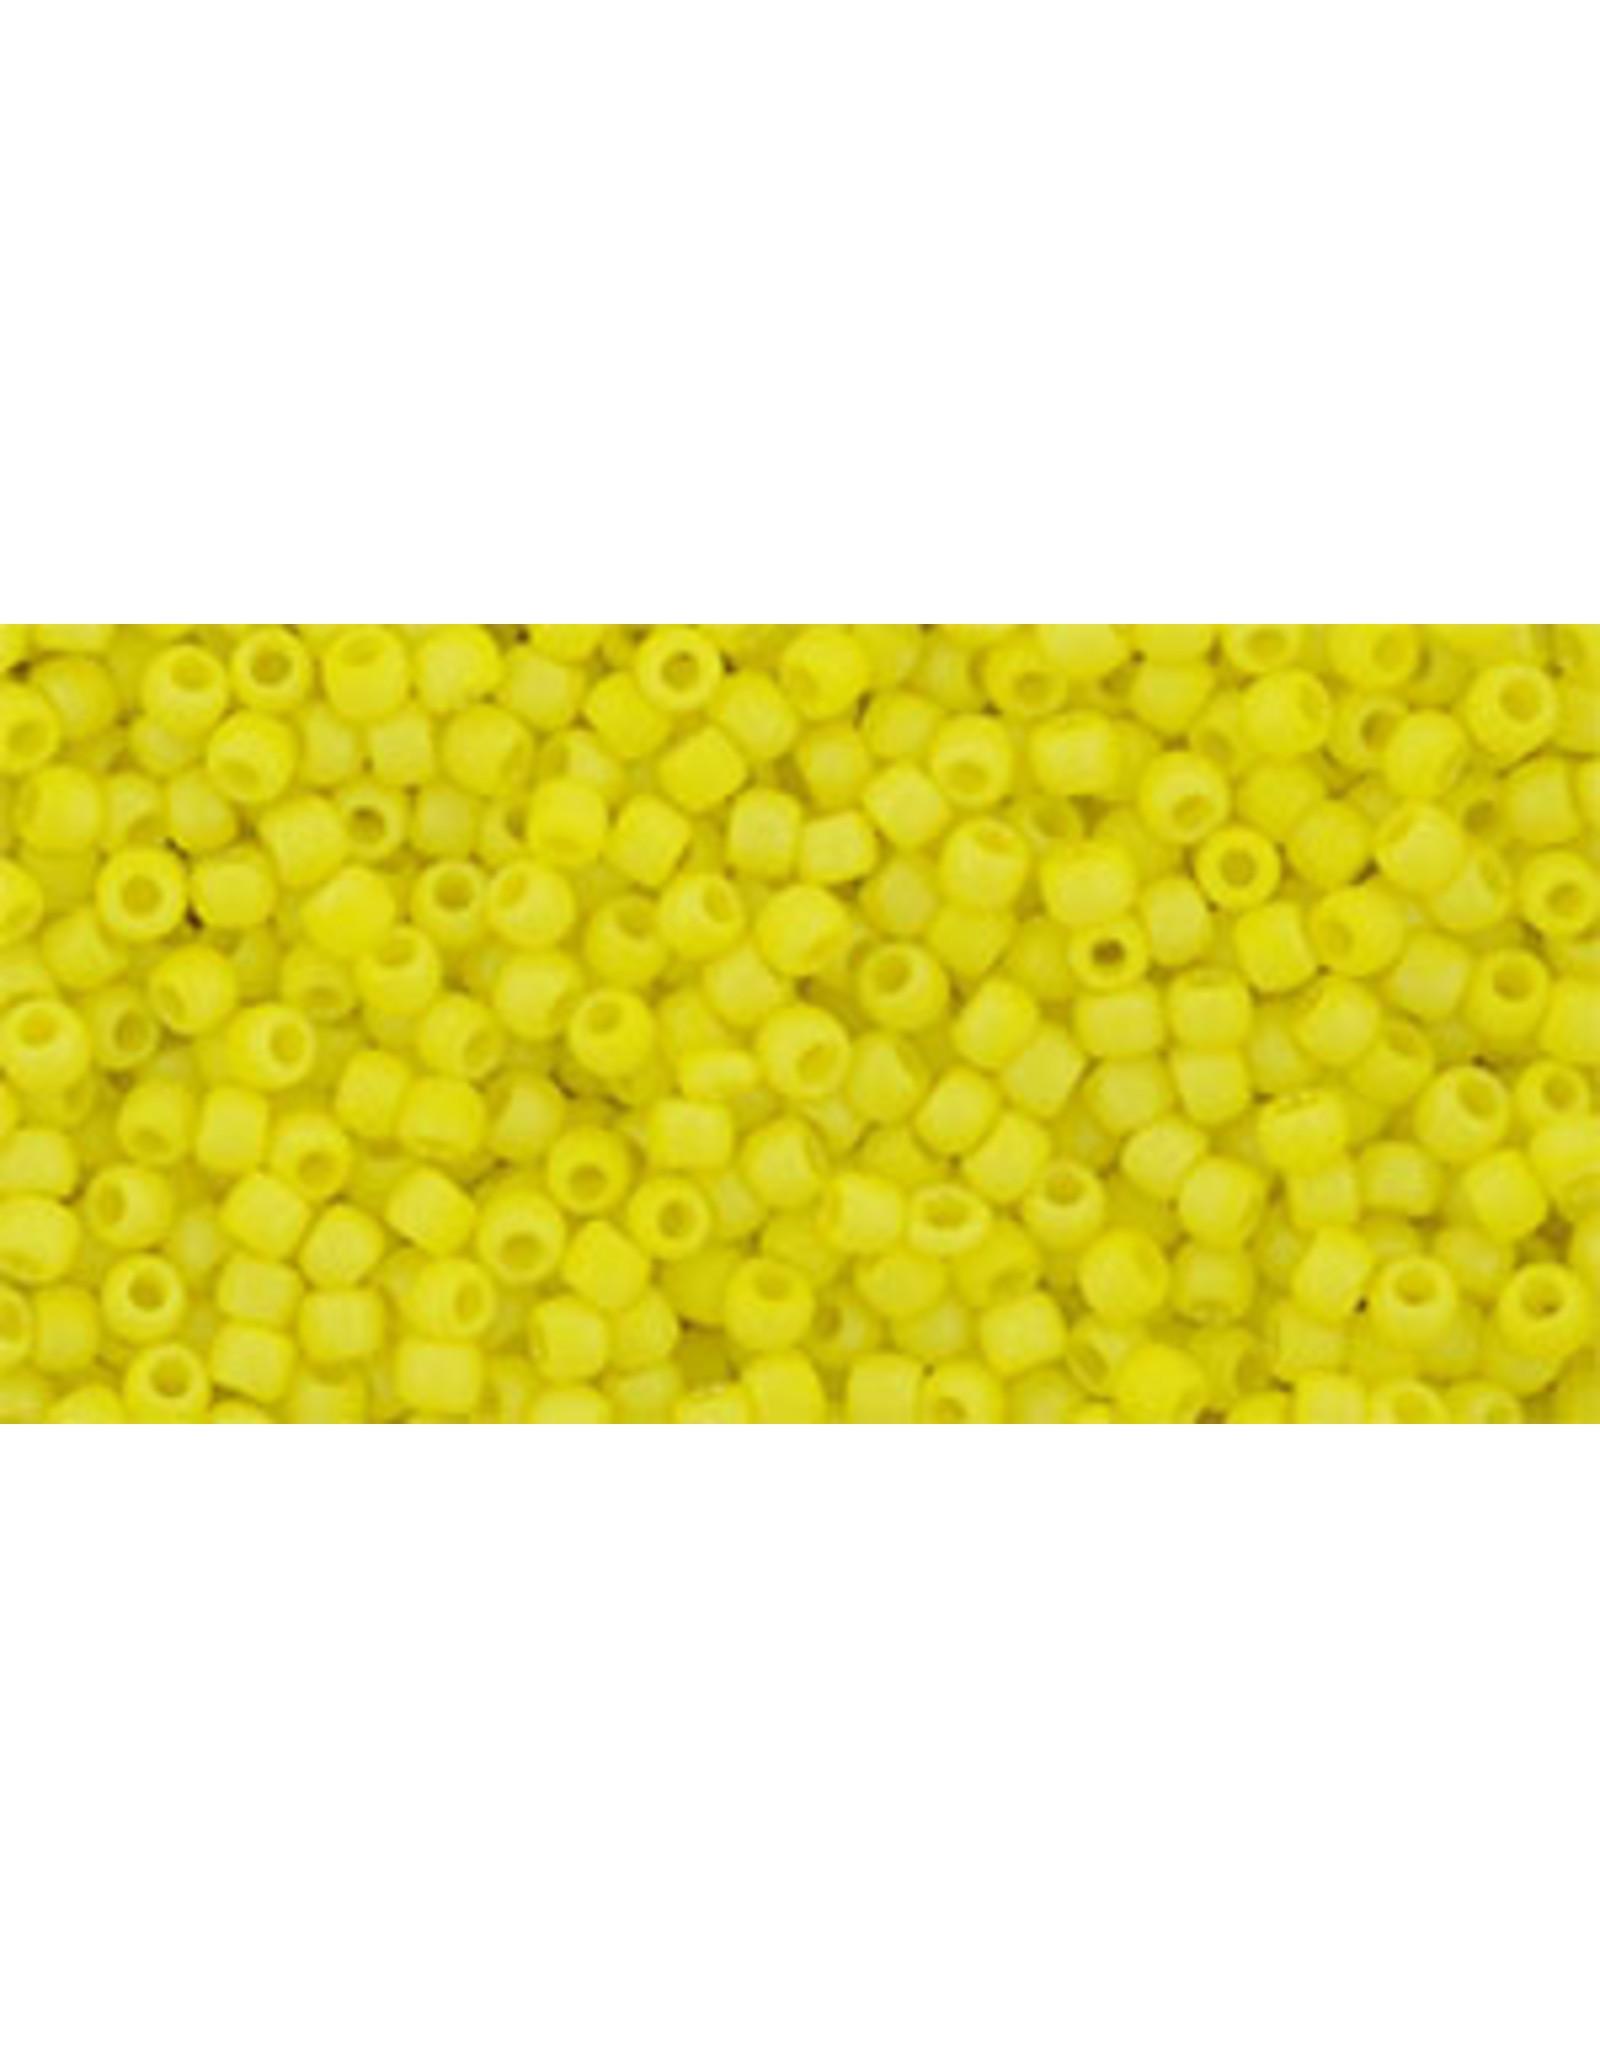 Toho 402fB 11  Round  40g  Opaque Yellow AB Matte